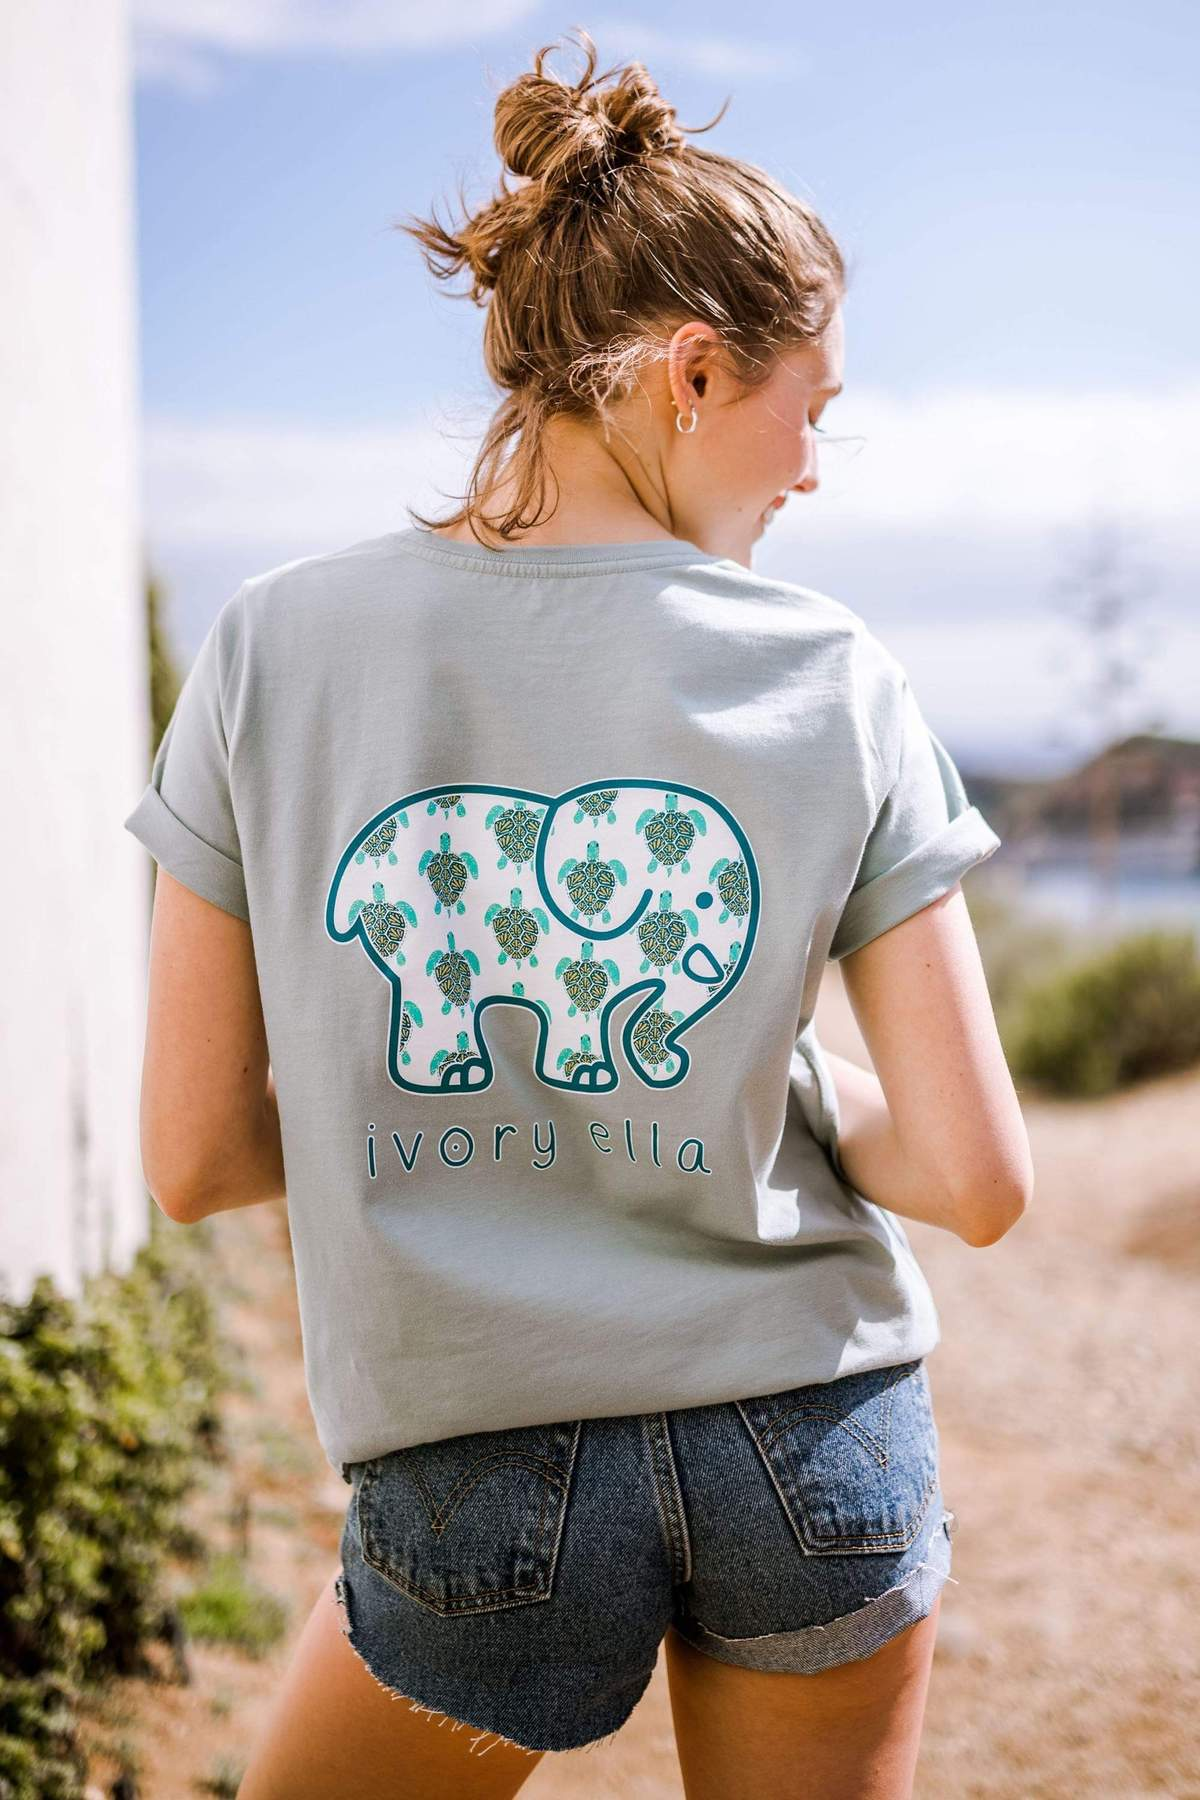 ivory-ella-women-s-short-sleeve-tees-xxs-ella-fit-pistachio-cat-coq-turtles-6638039629939_1200x.jpg